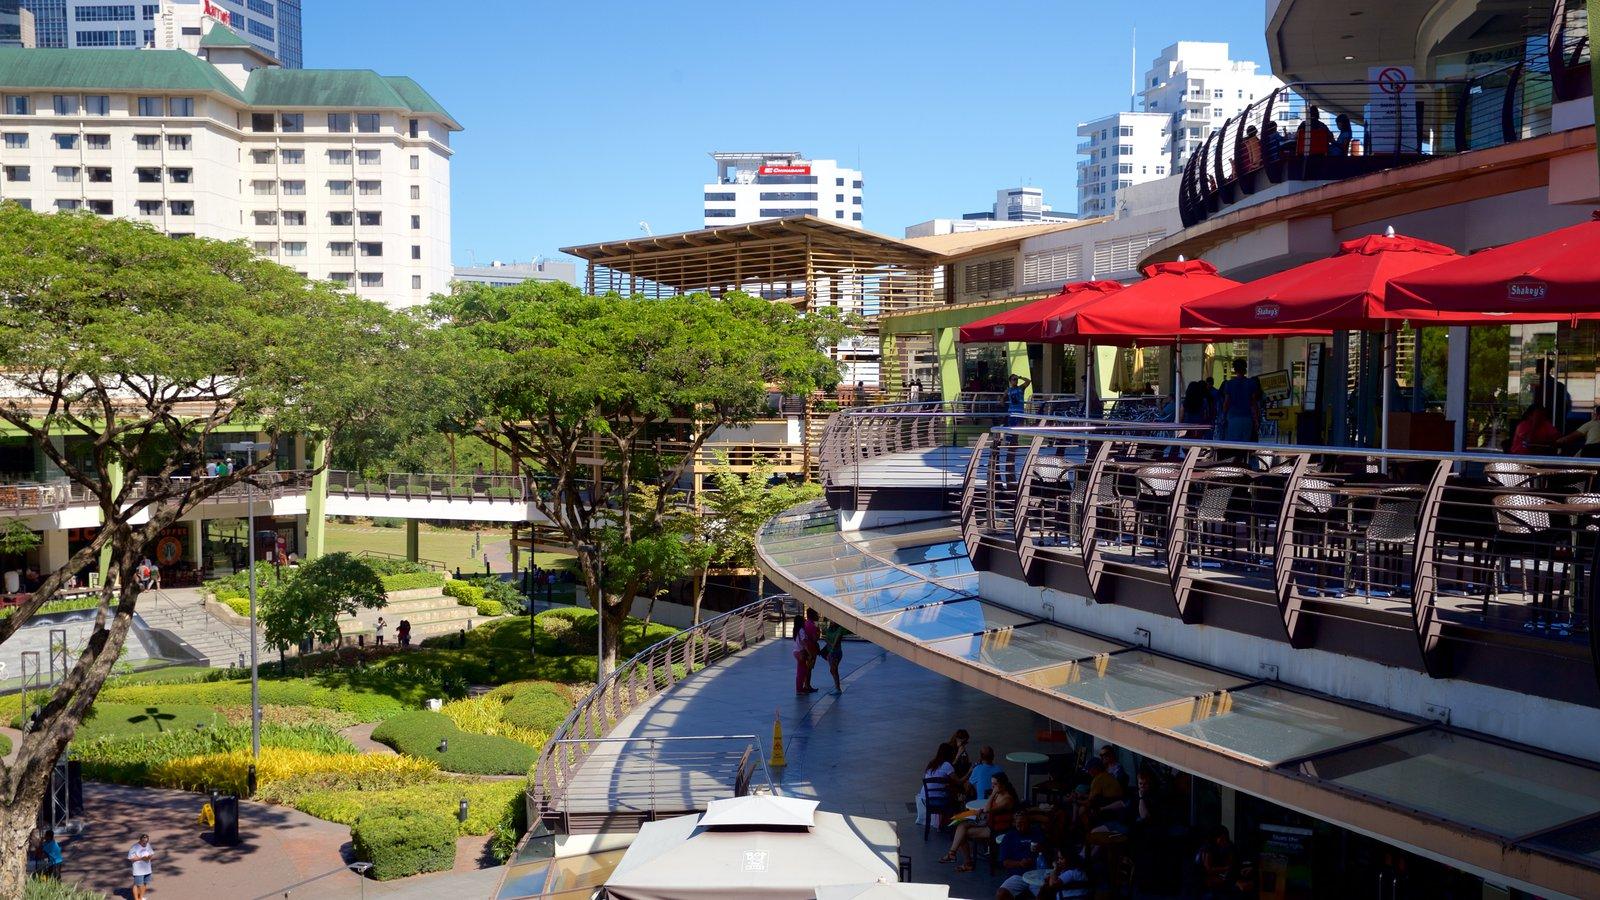 Modern Architecture In The Philippines modern architecture pictures: view images of philippines